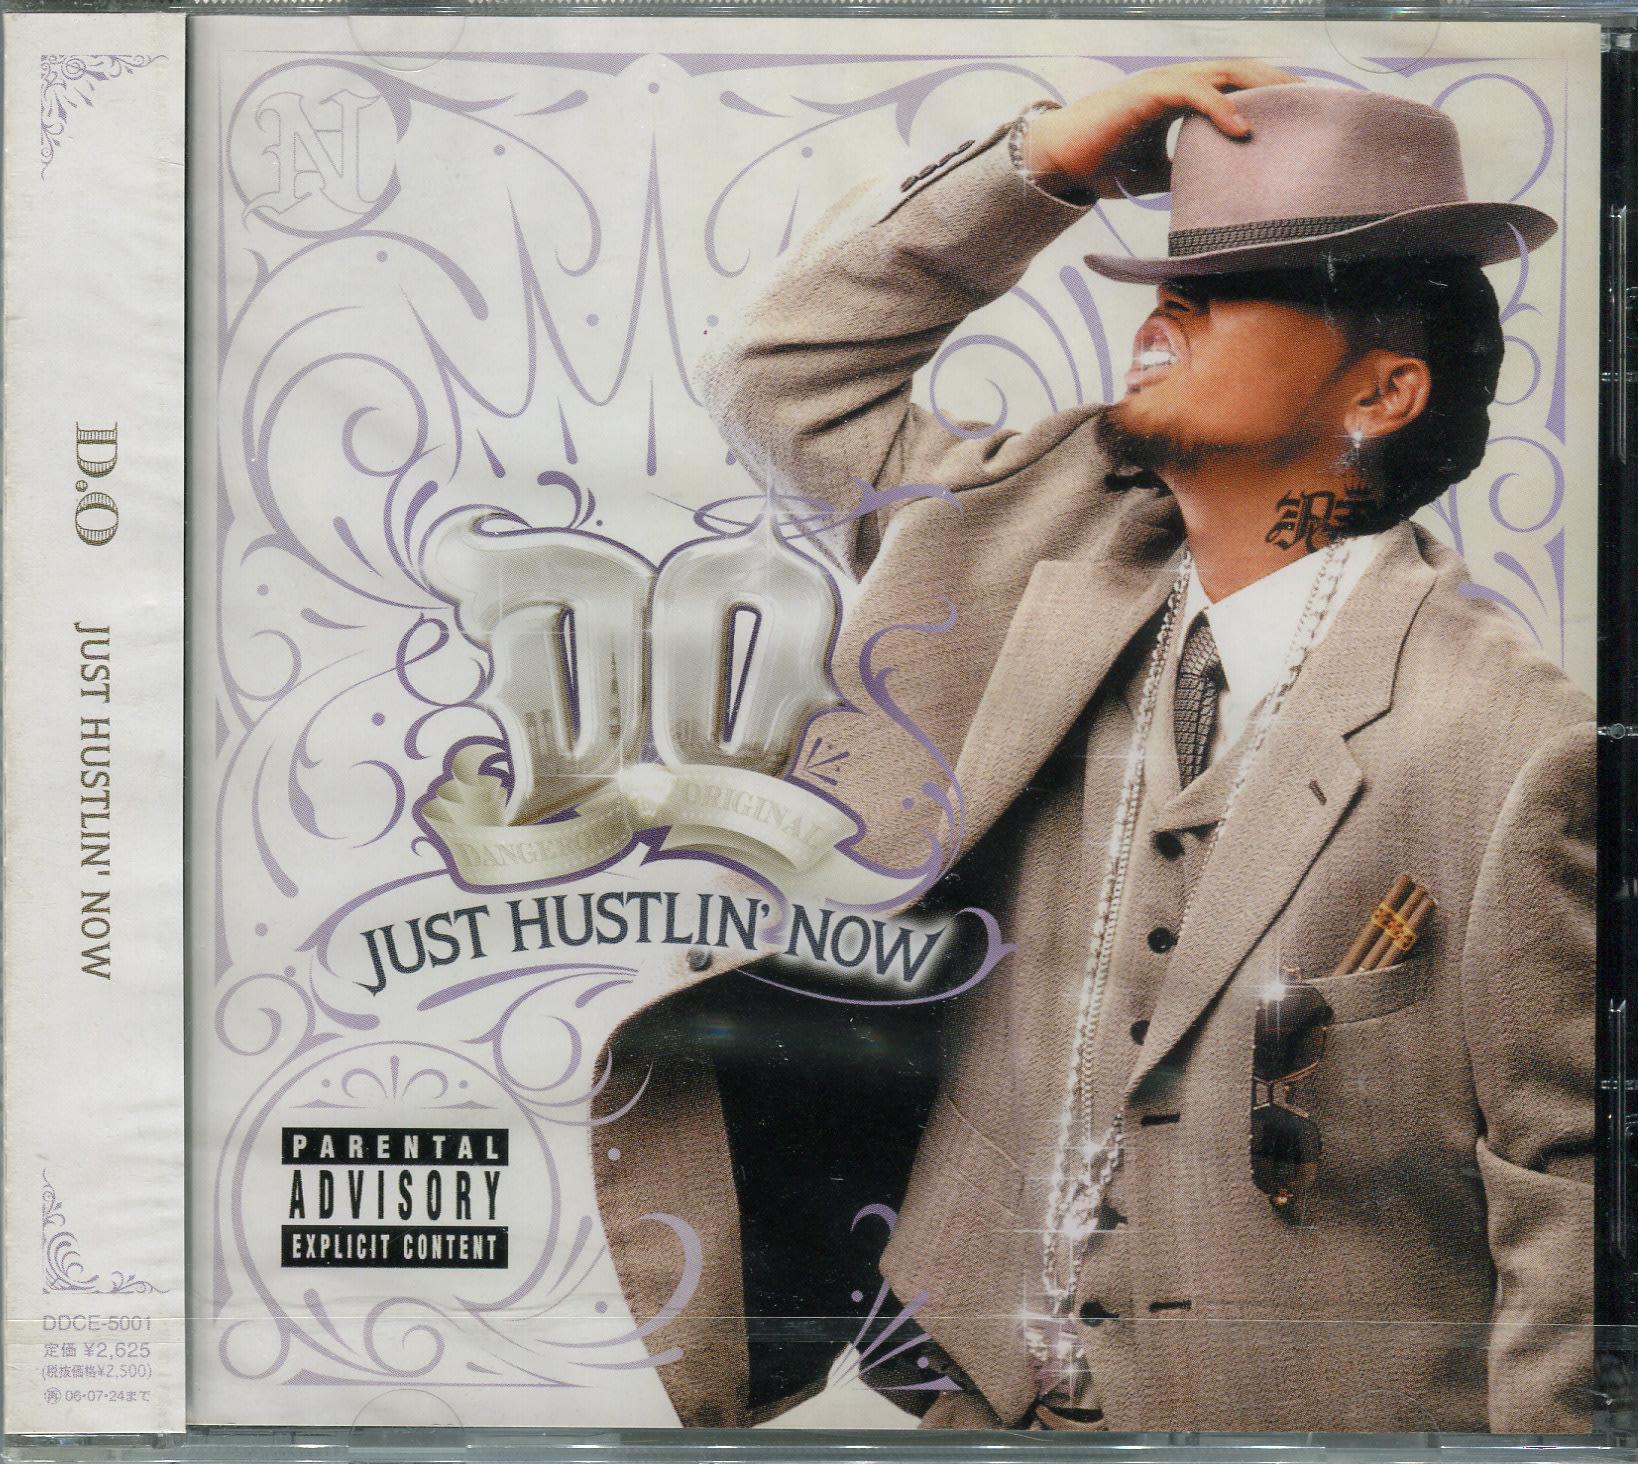 【嘟嘟音樂2】Just Hustlin Now - D.O  日本版  (全新未拆封)